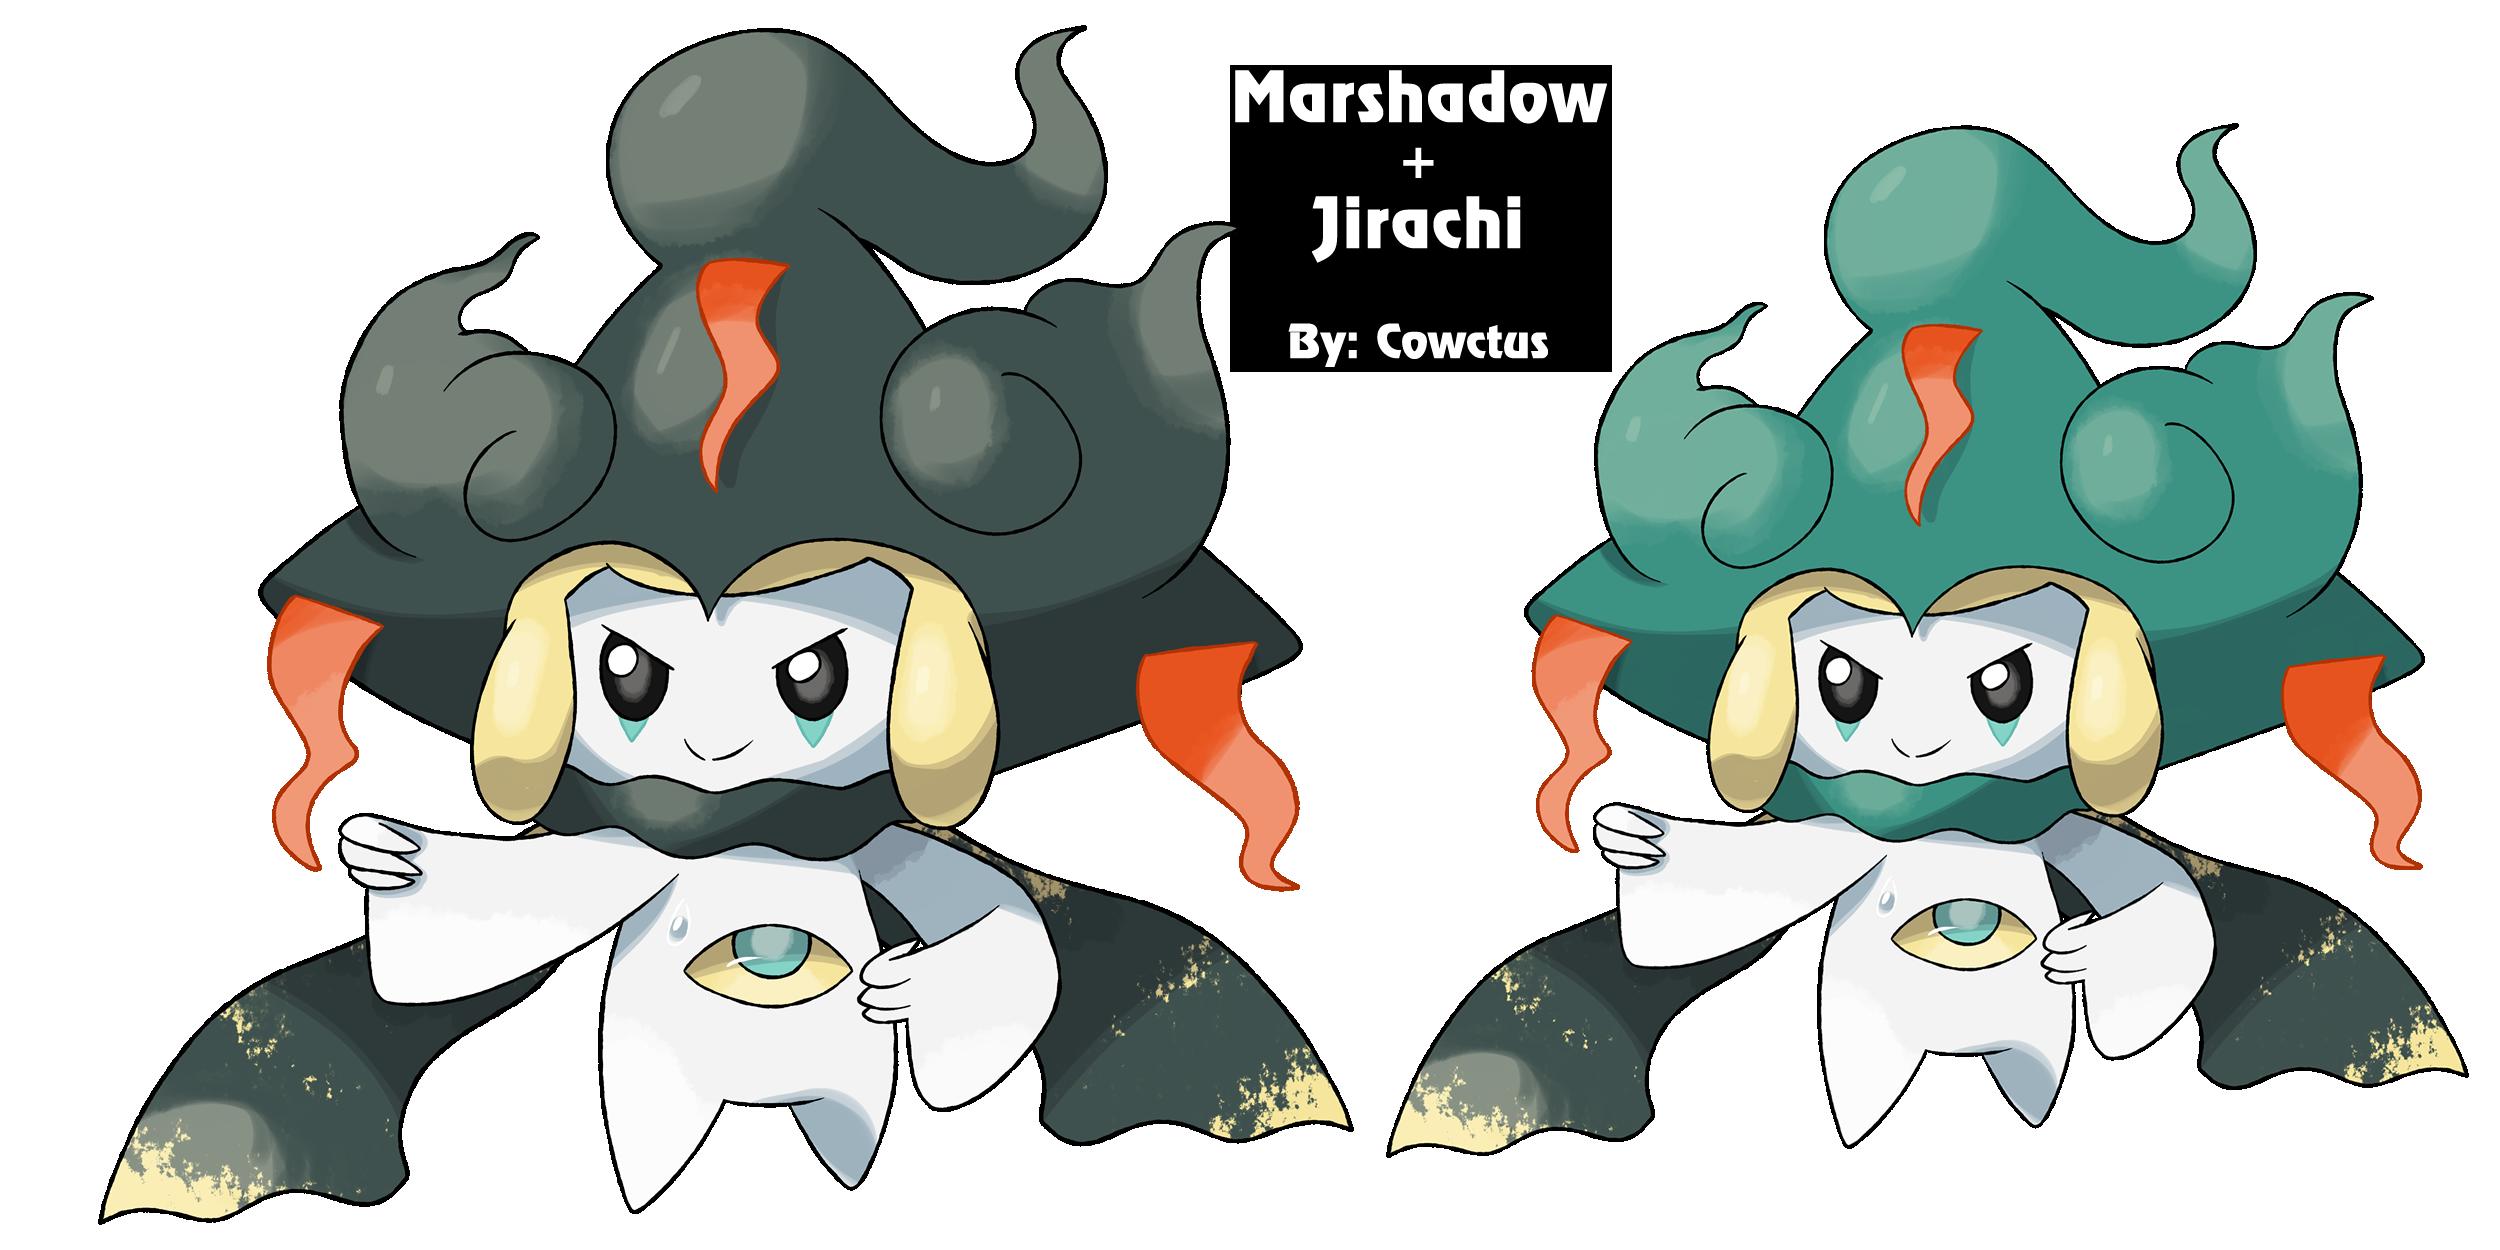 Cow clipart shadow. Pokemon version jirachi event